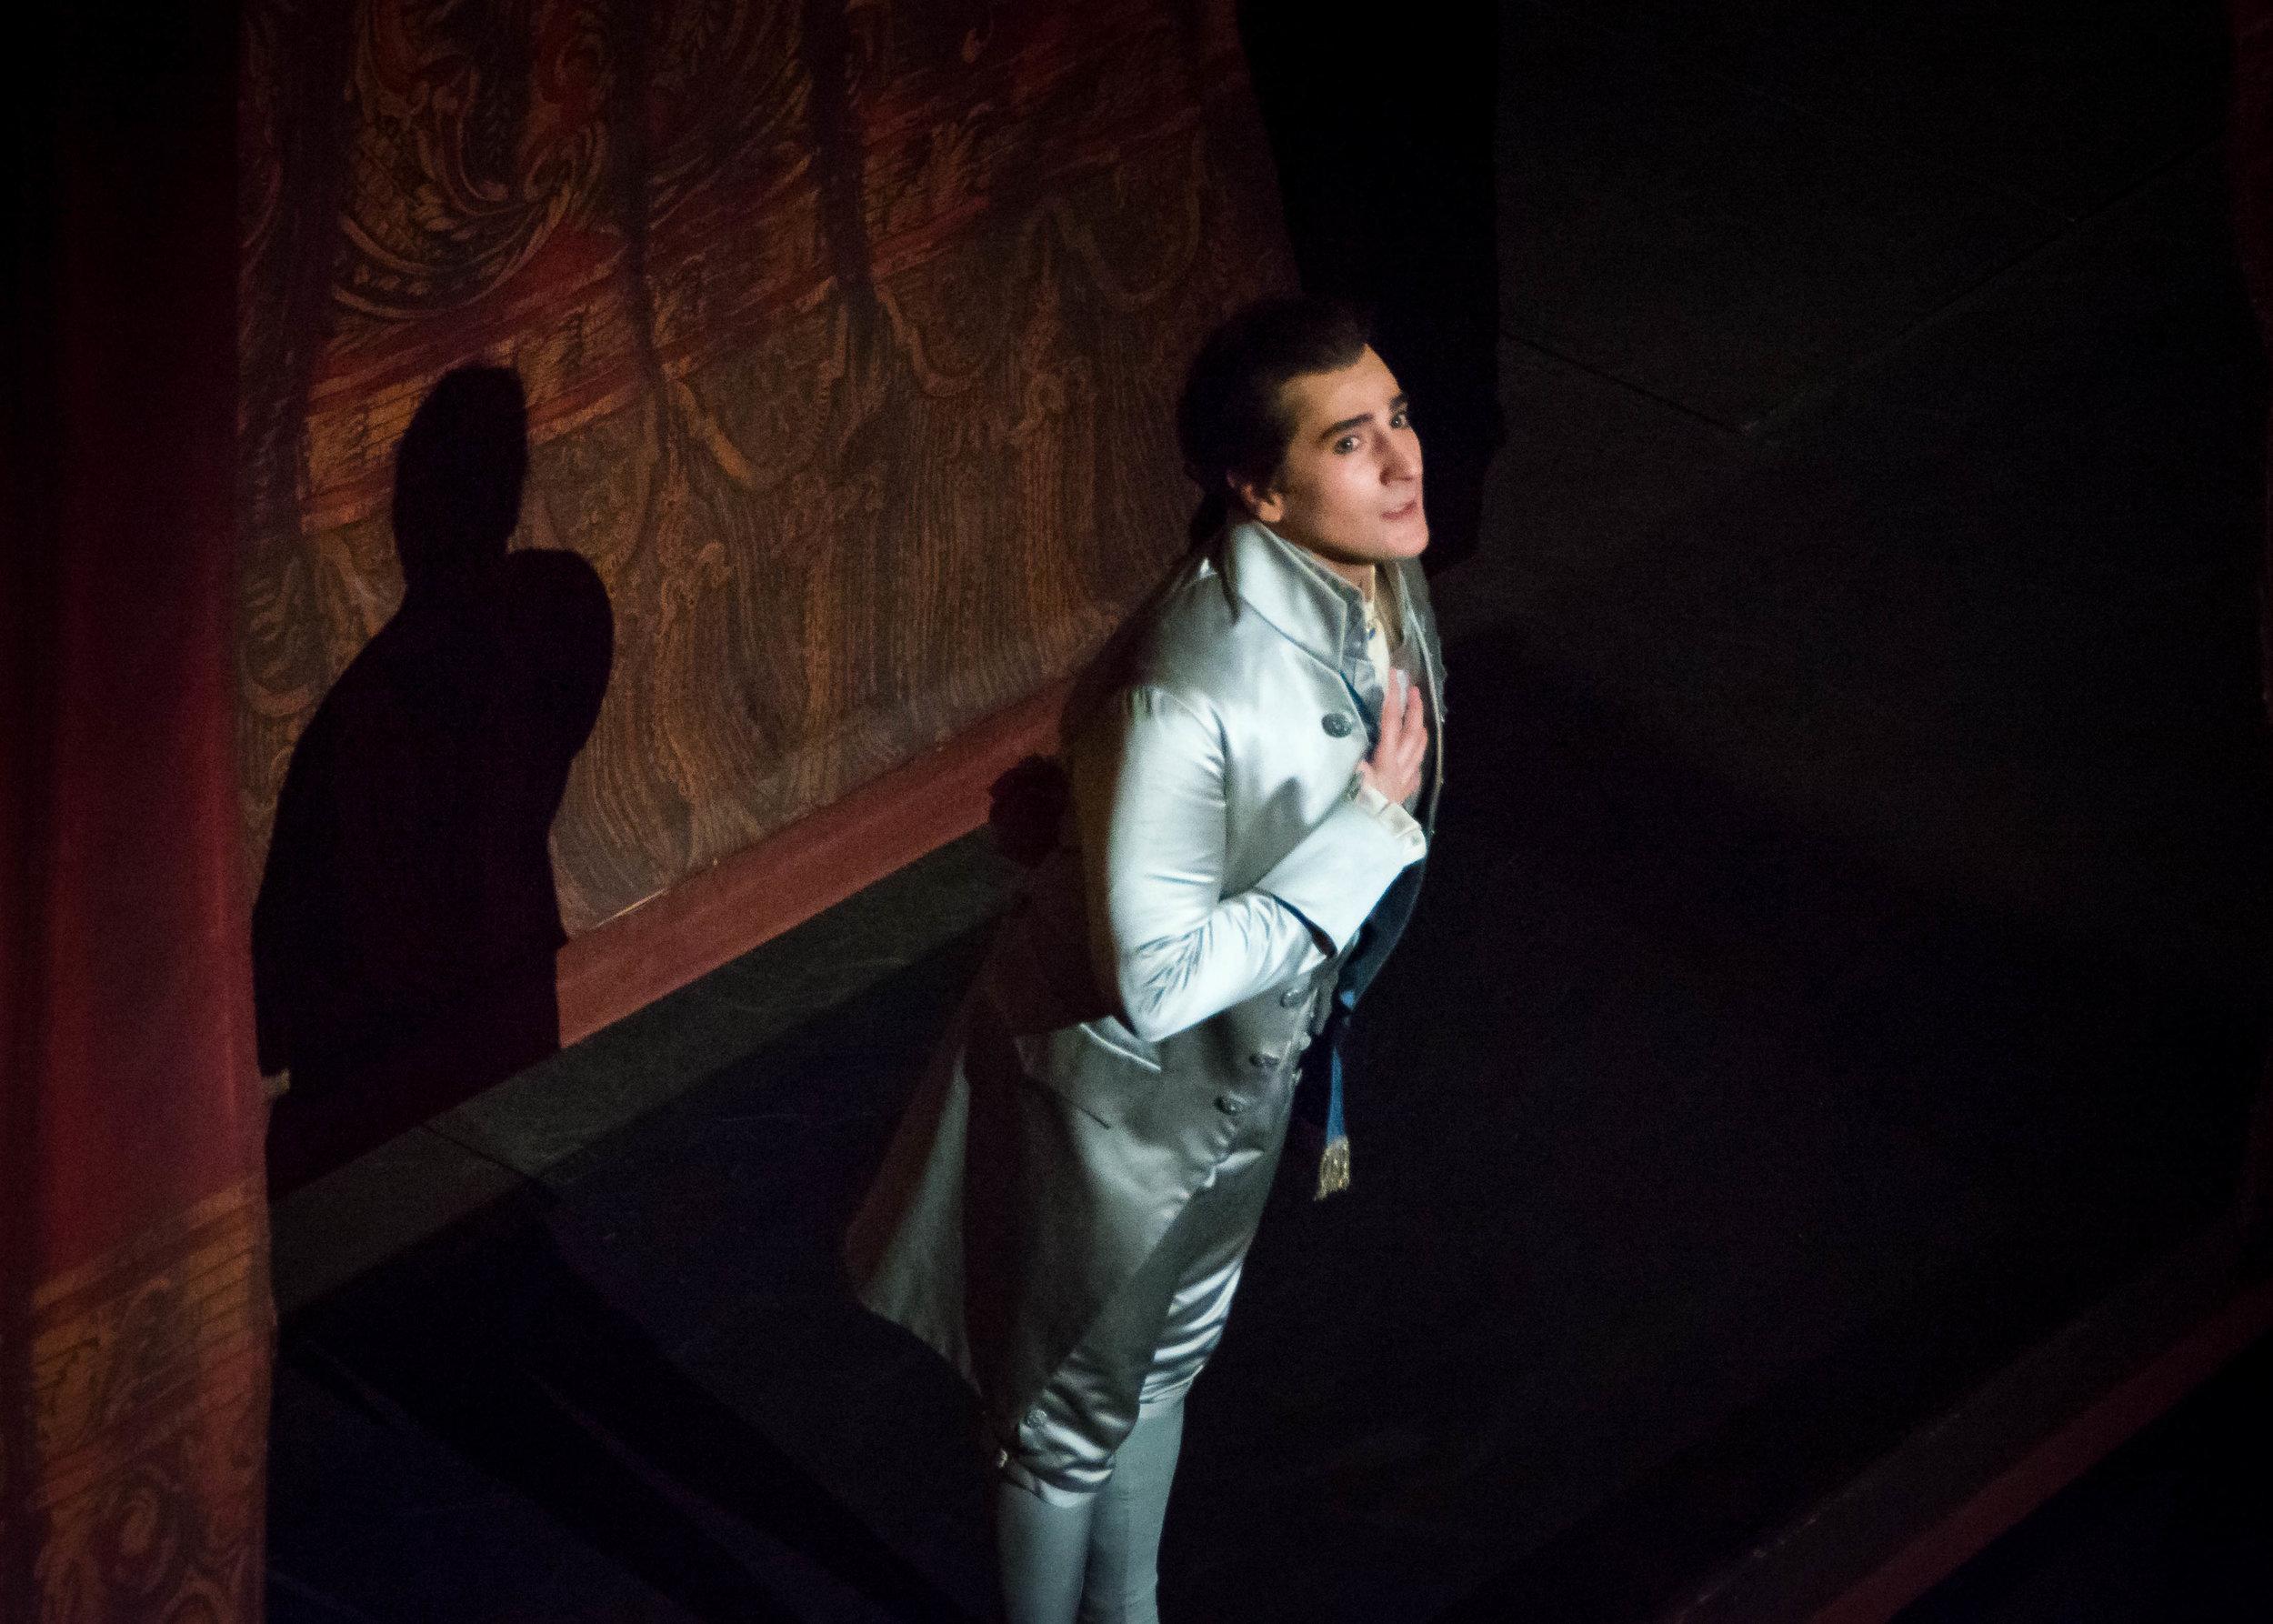 Leonardo Capalbo as Gustavo in  Un ballo in maschera  at the Royal Swedish Opera